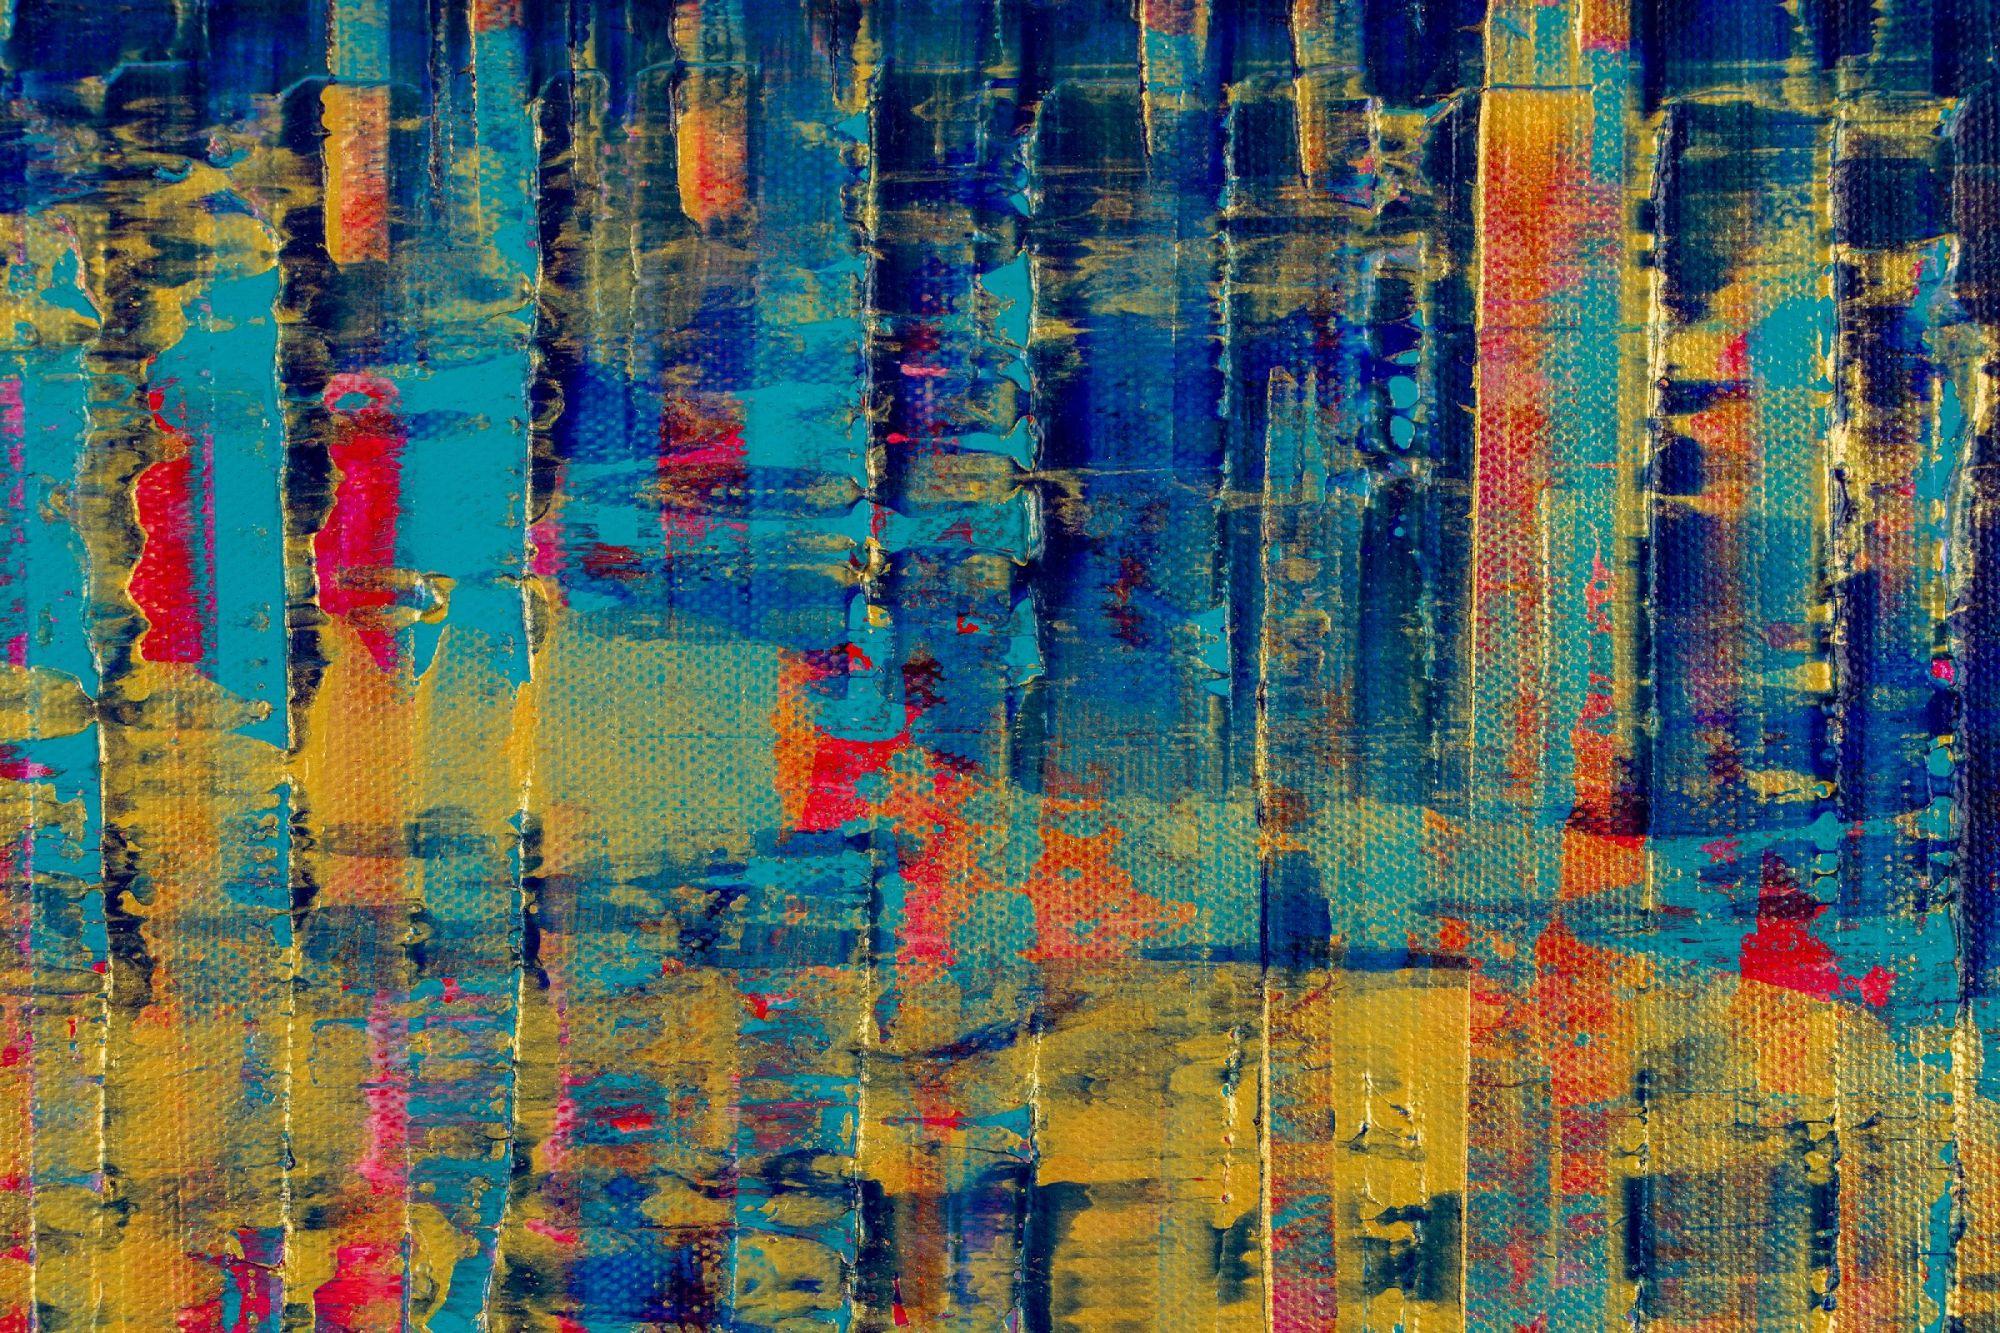 Detail / Breeze Intrusion (Gold Cracks) 2020 / Triptych by Nestor Toro